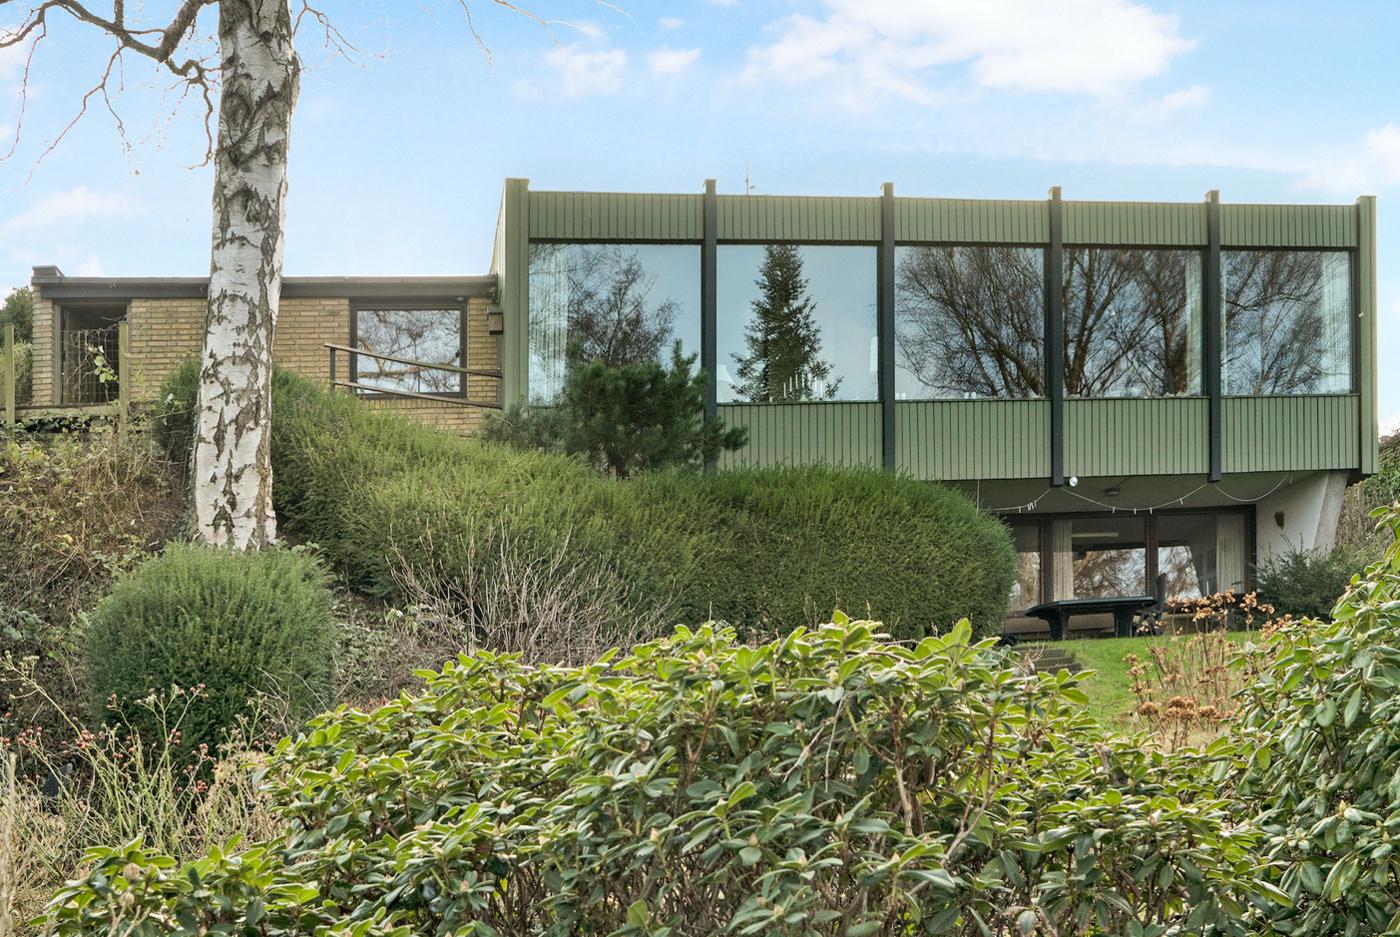 Anders Lund Madsen har købt en villa direkte ned til Lyngby Sø. Foto: RobinHus City, Gentofte & Lyngby-Taabæk.